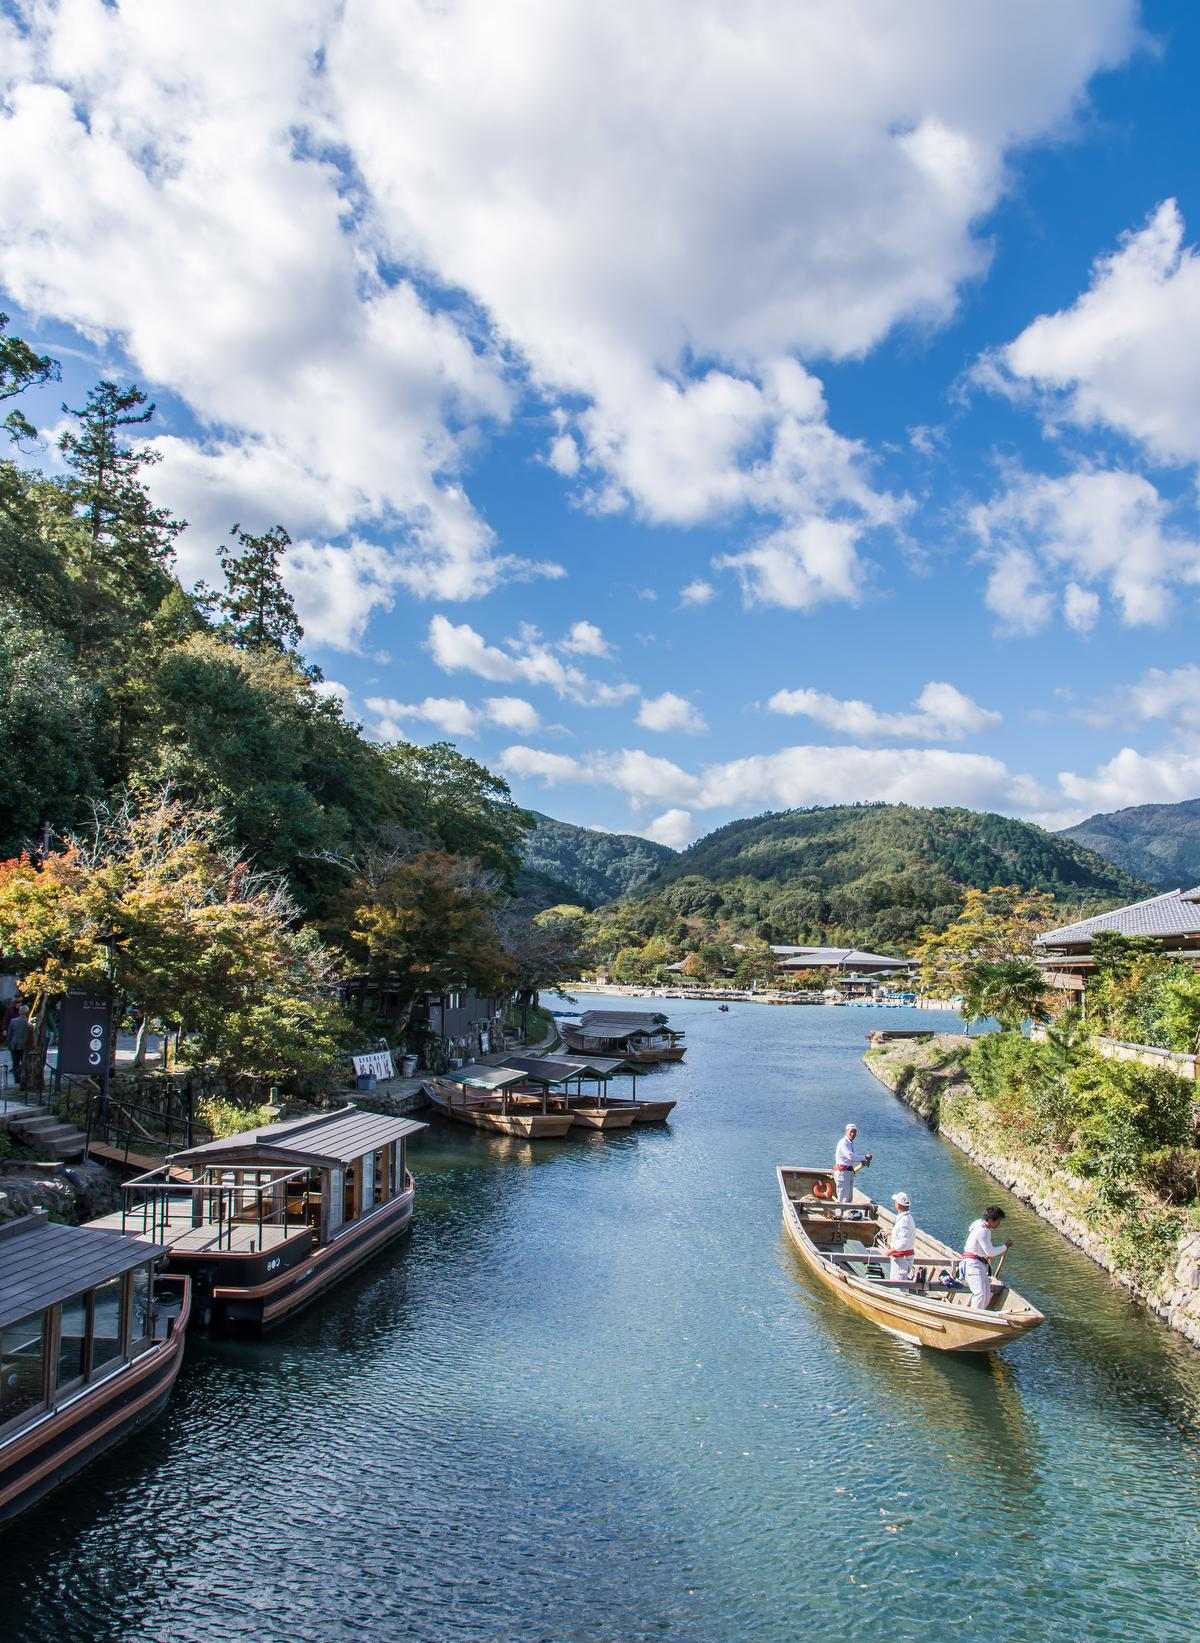 Overweldigende natuurpracht in Arashiyama. (foto SB) ©sbedaux